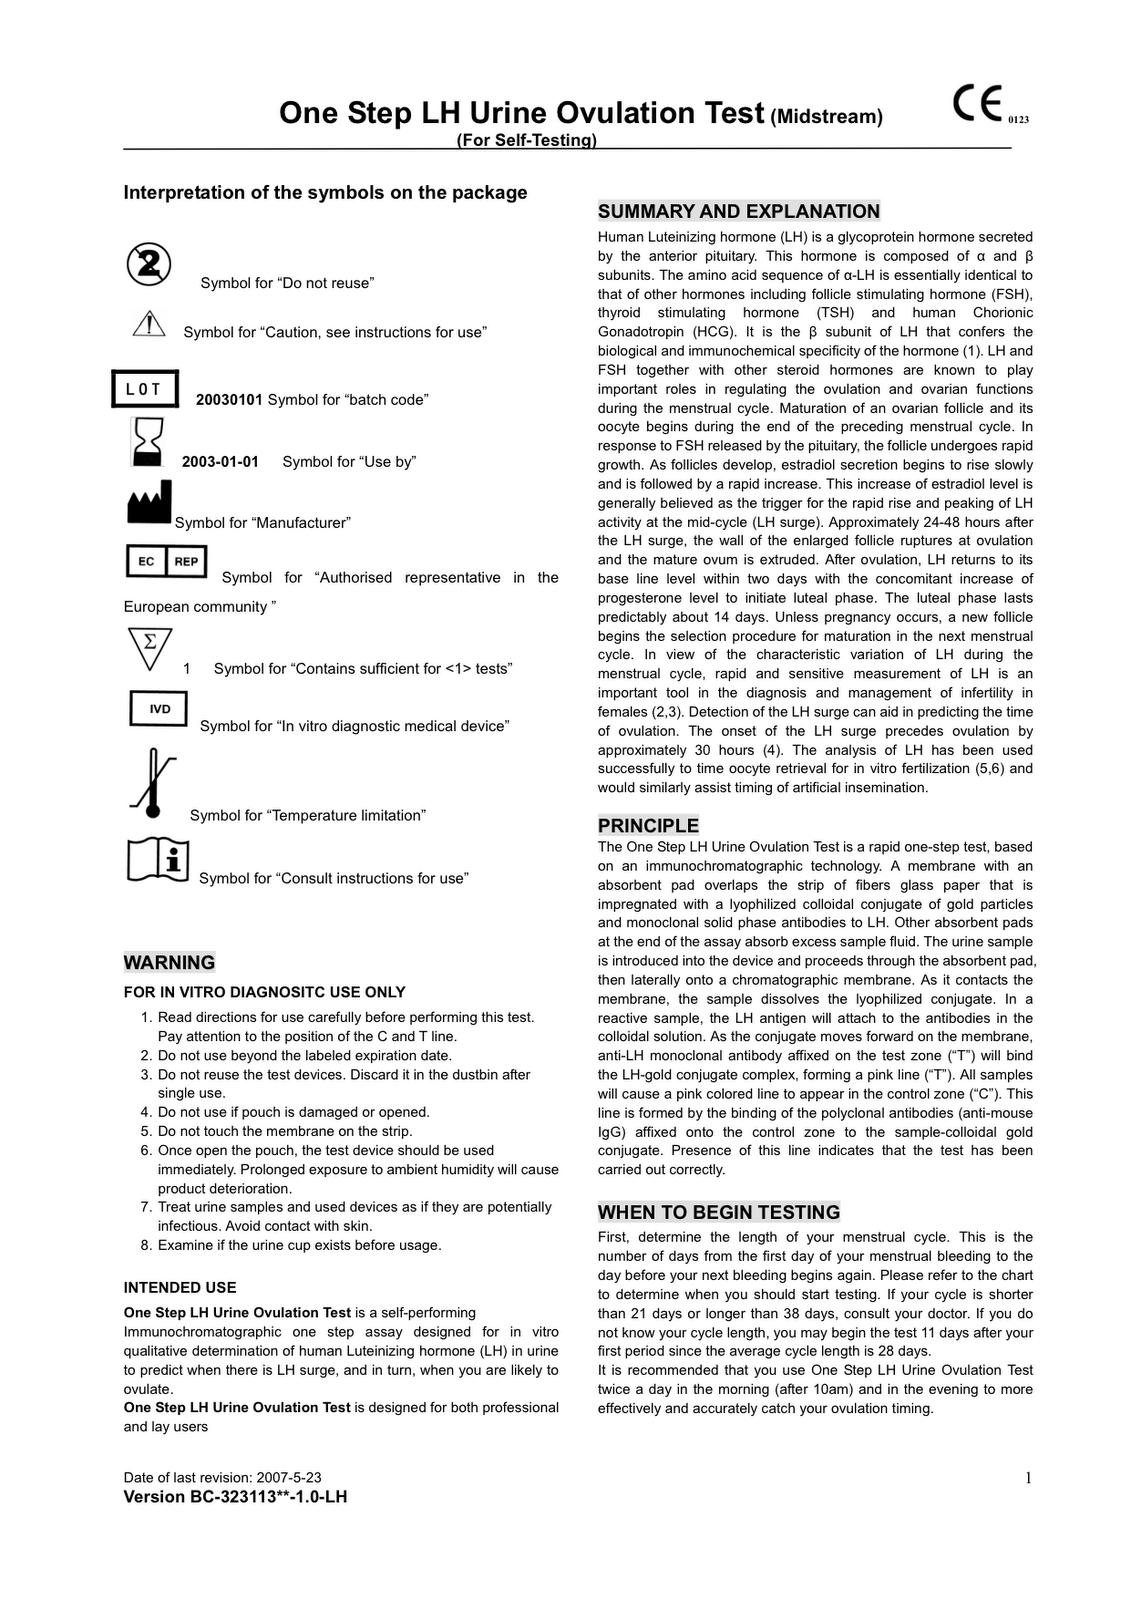 ovulation predictor kit instructions